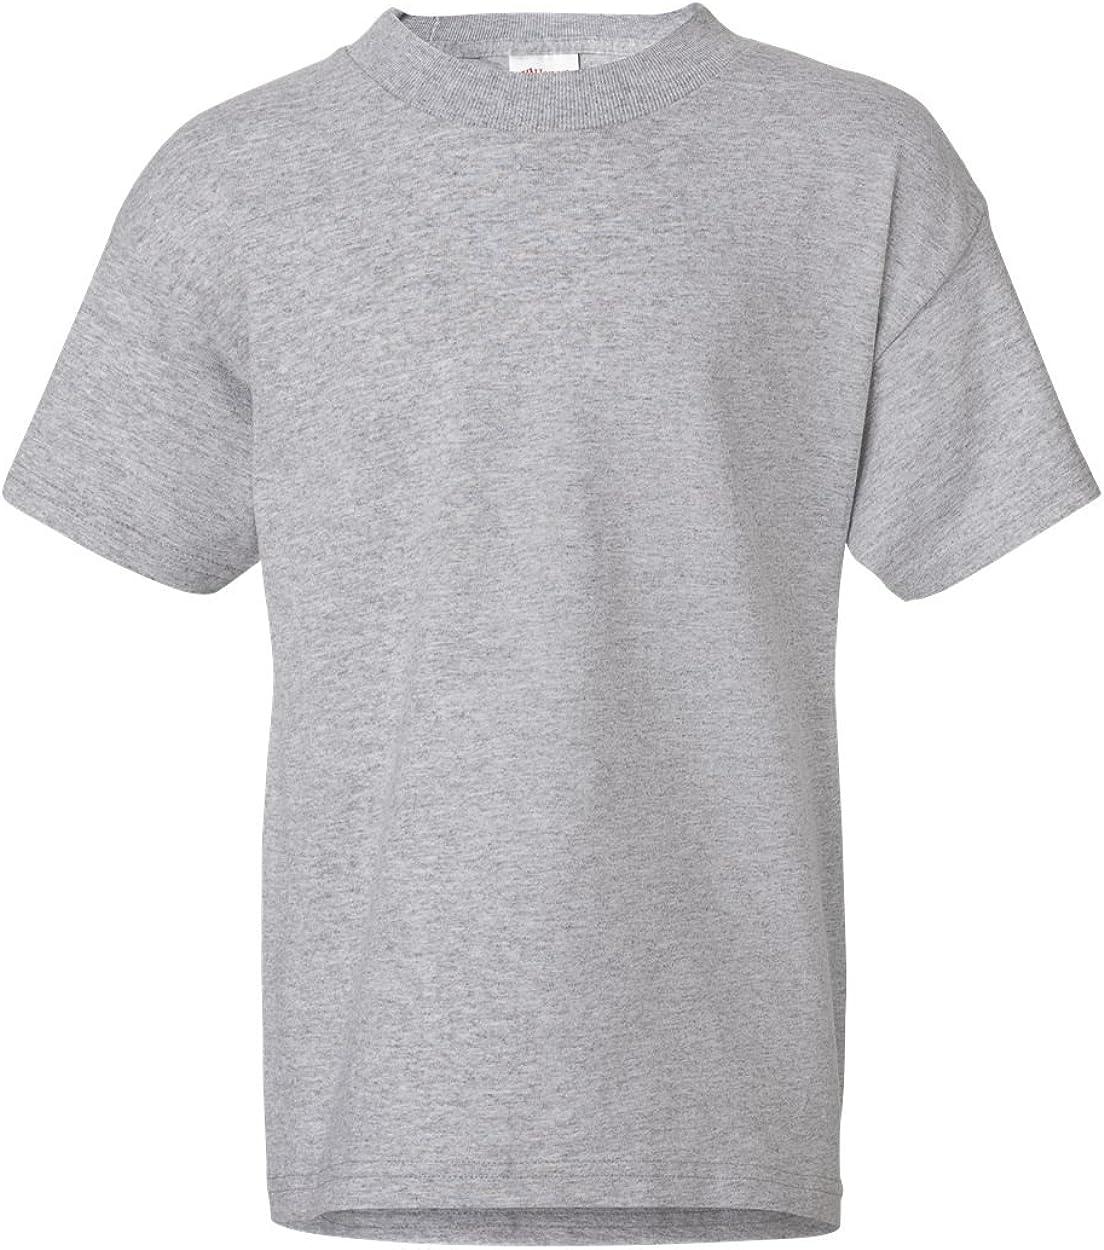 2-Pack Hanes ComfortSoft Youth Short Sleeve Tagless T-Shirt, Lt Steel, M (8)